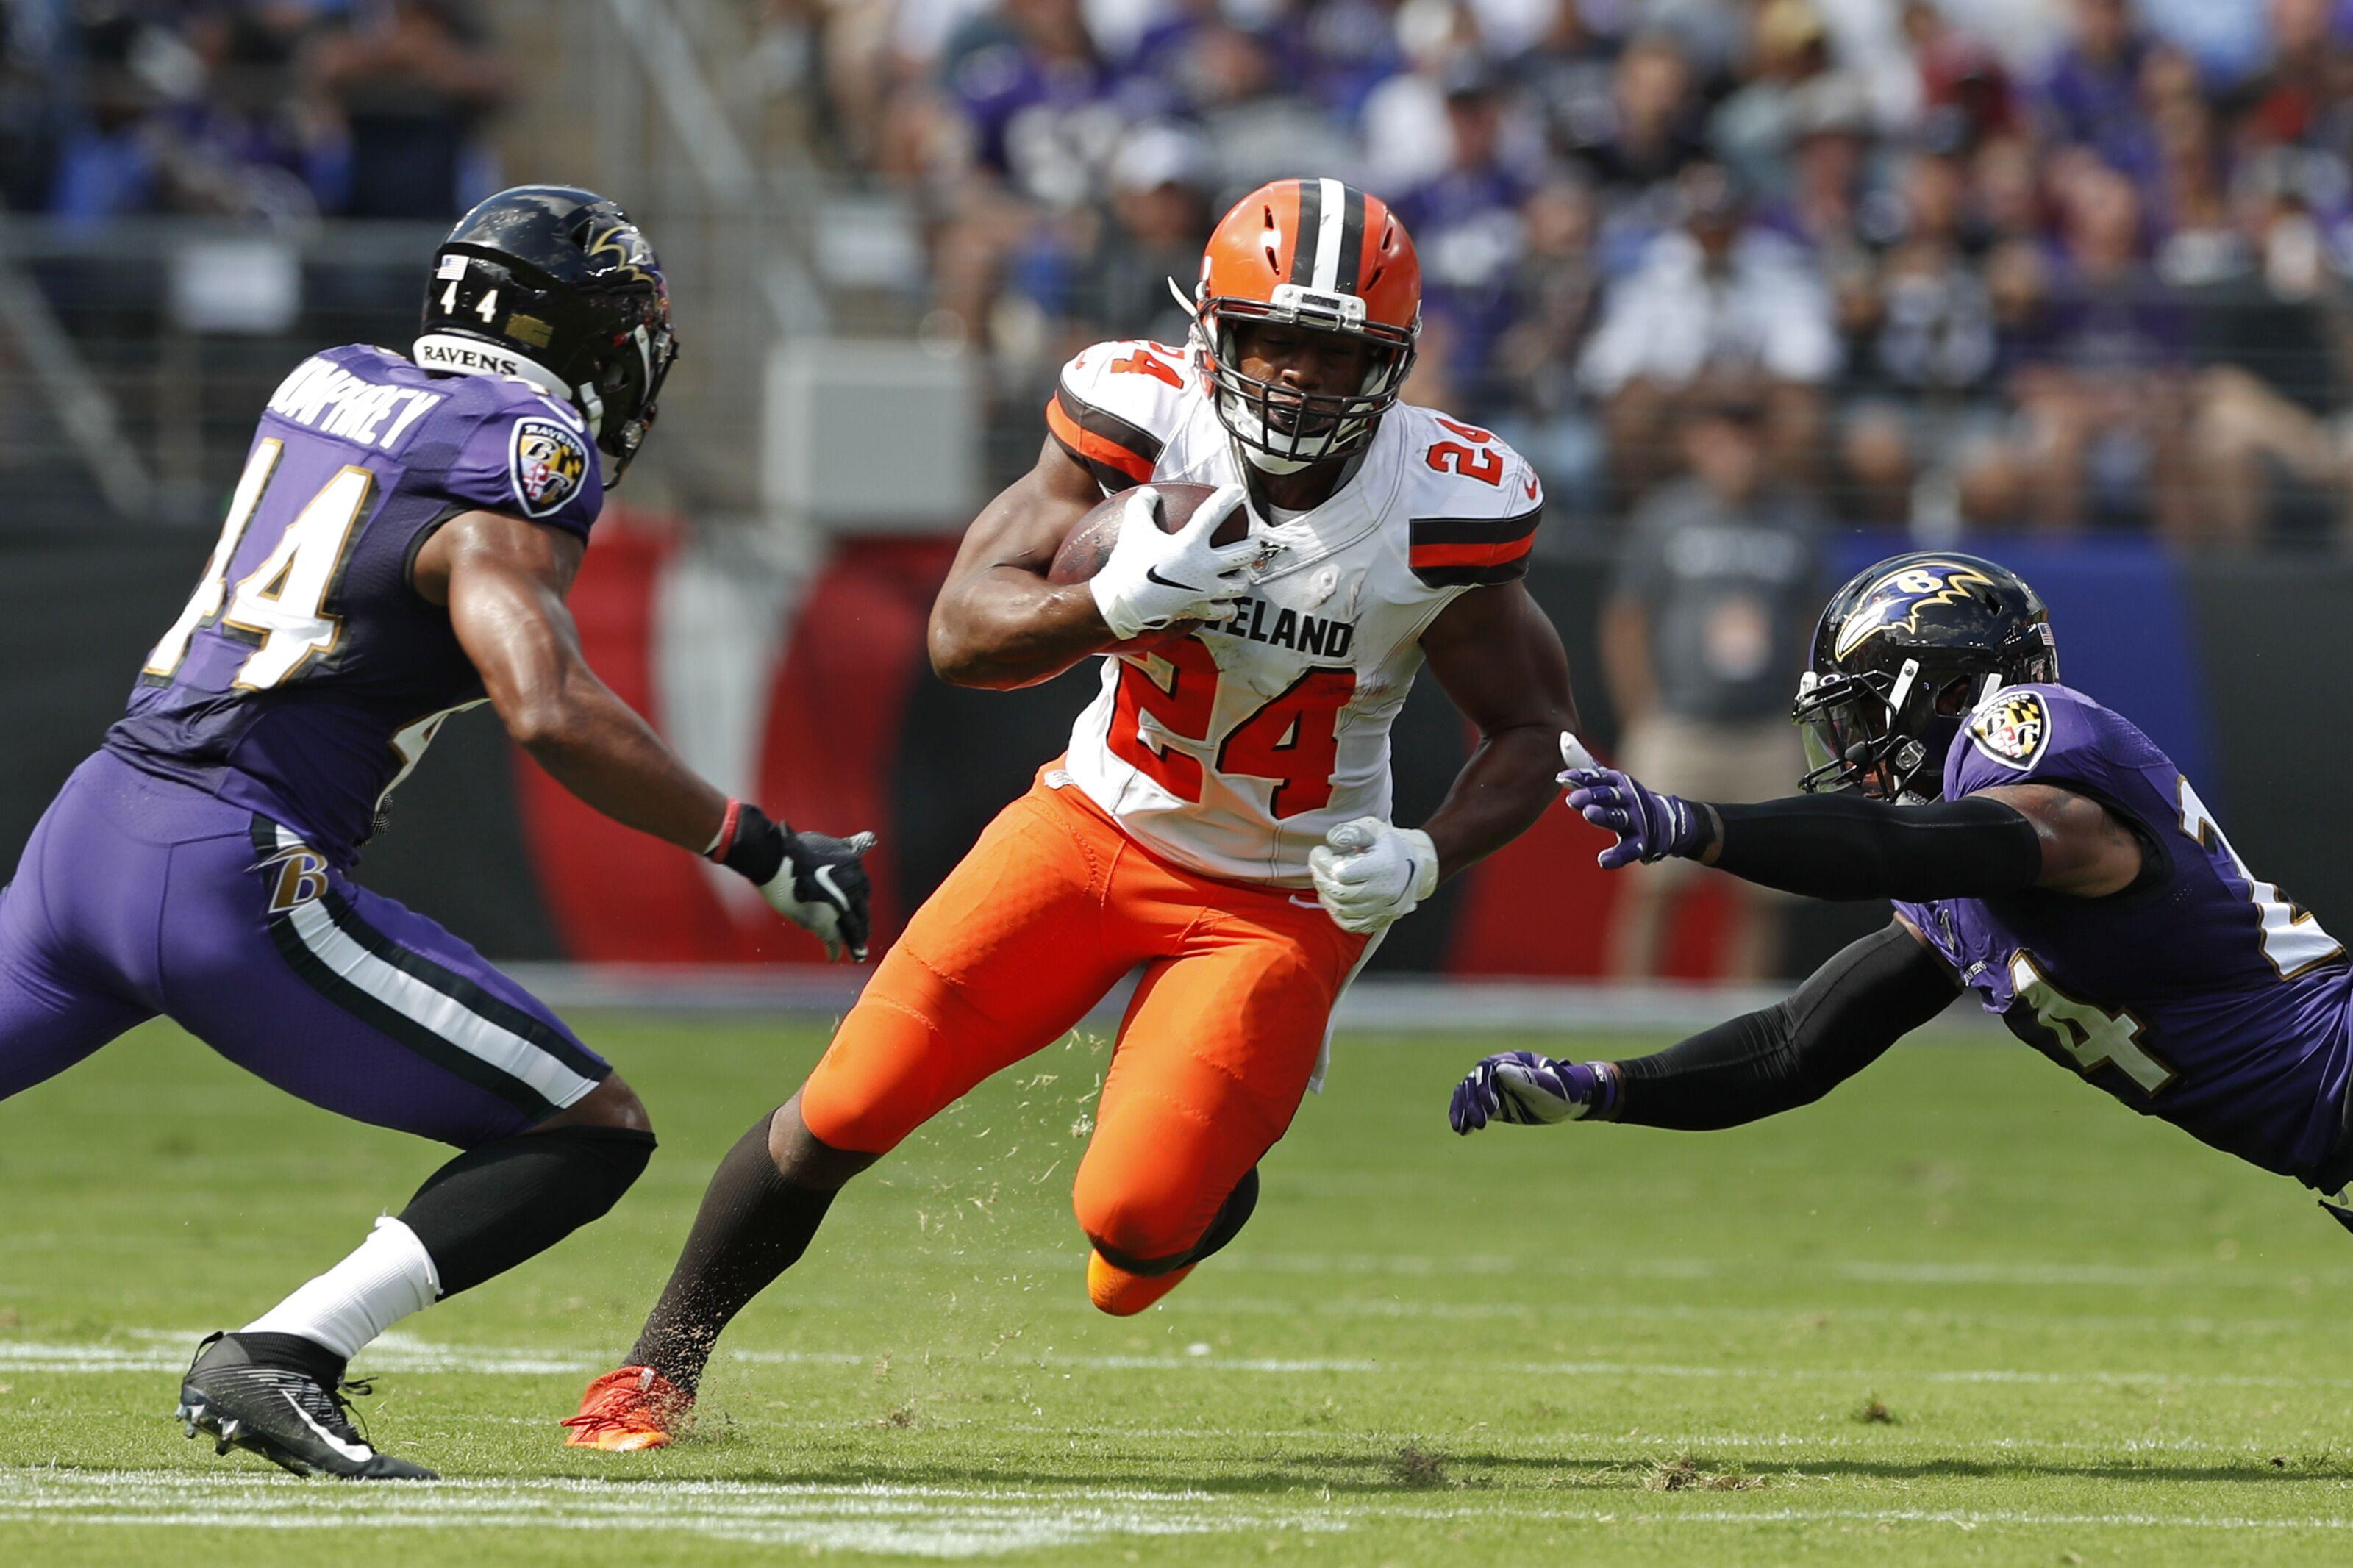 2019 NFL power rankings, Week 5: Browns impress, Falcons regress